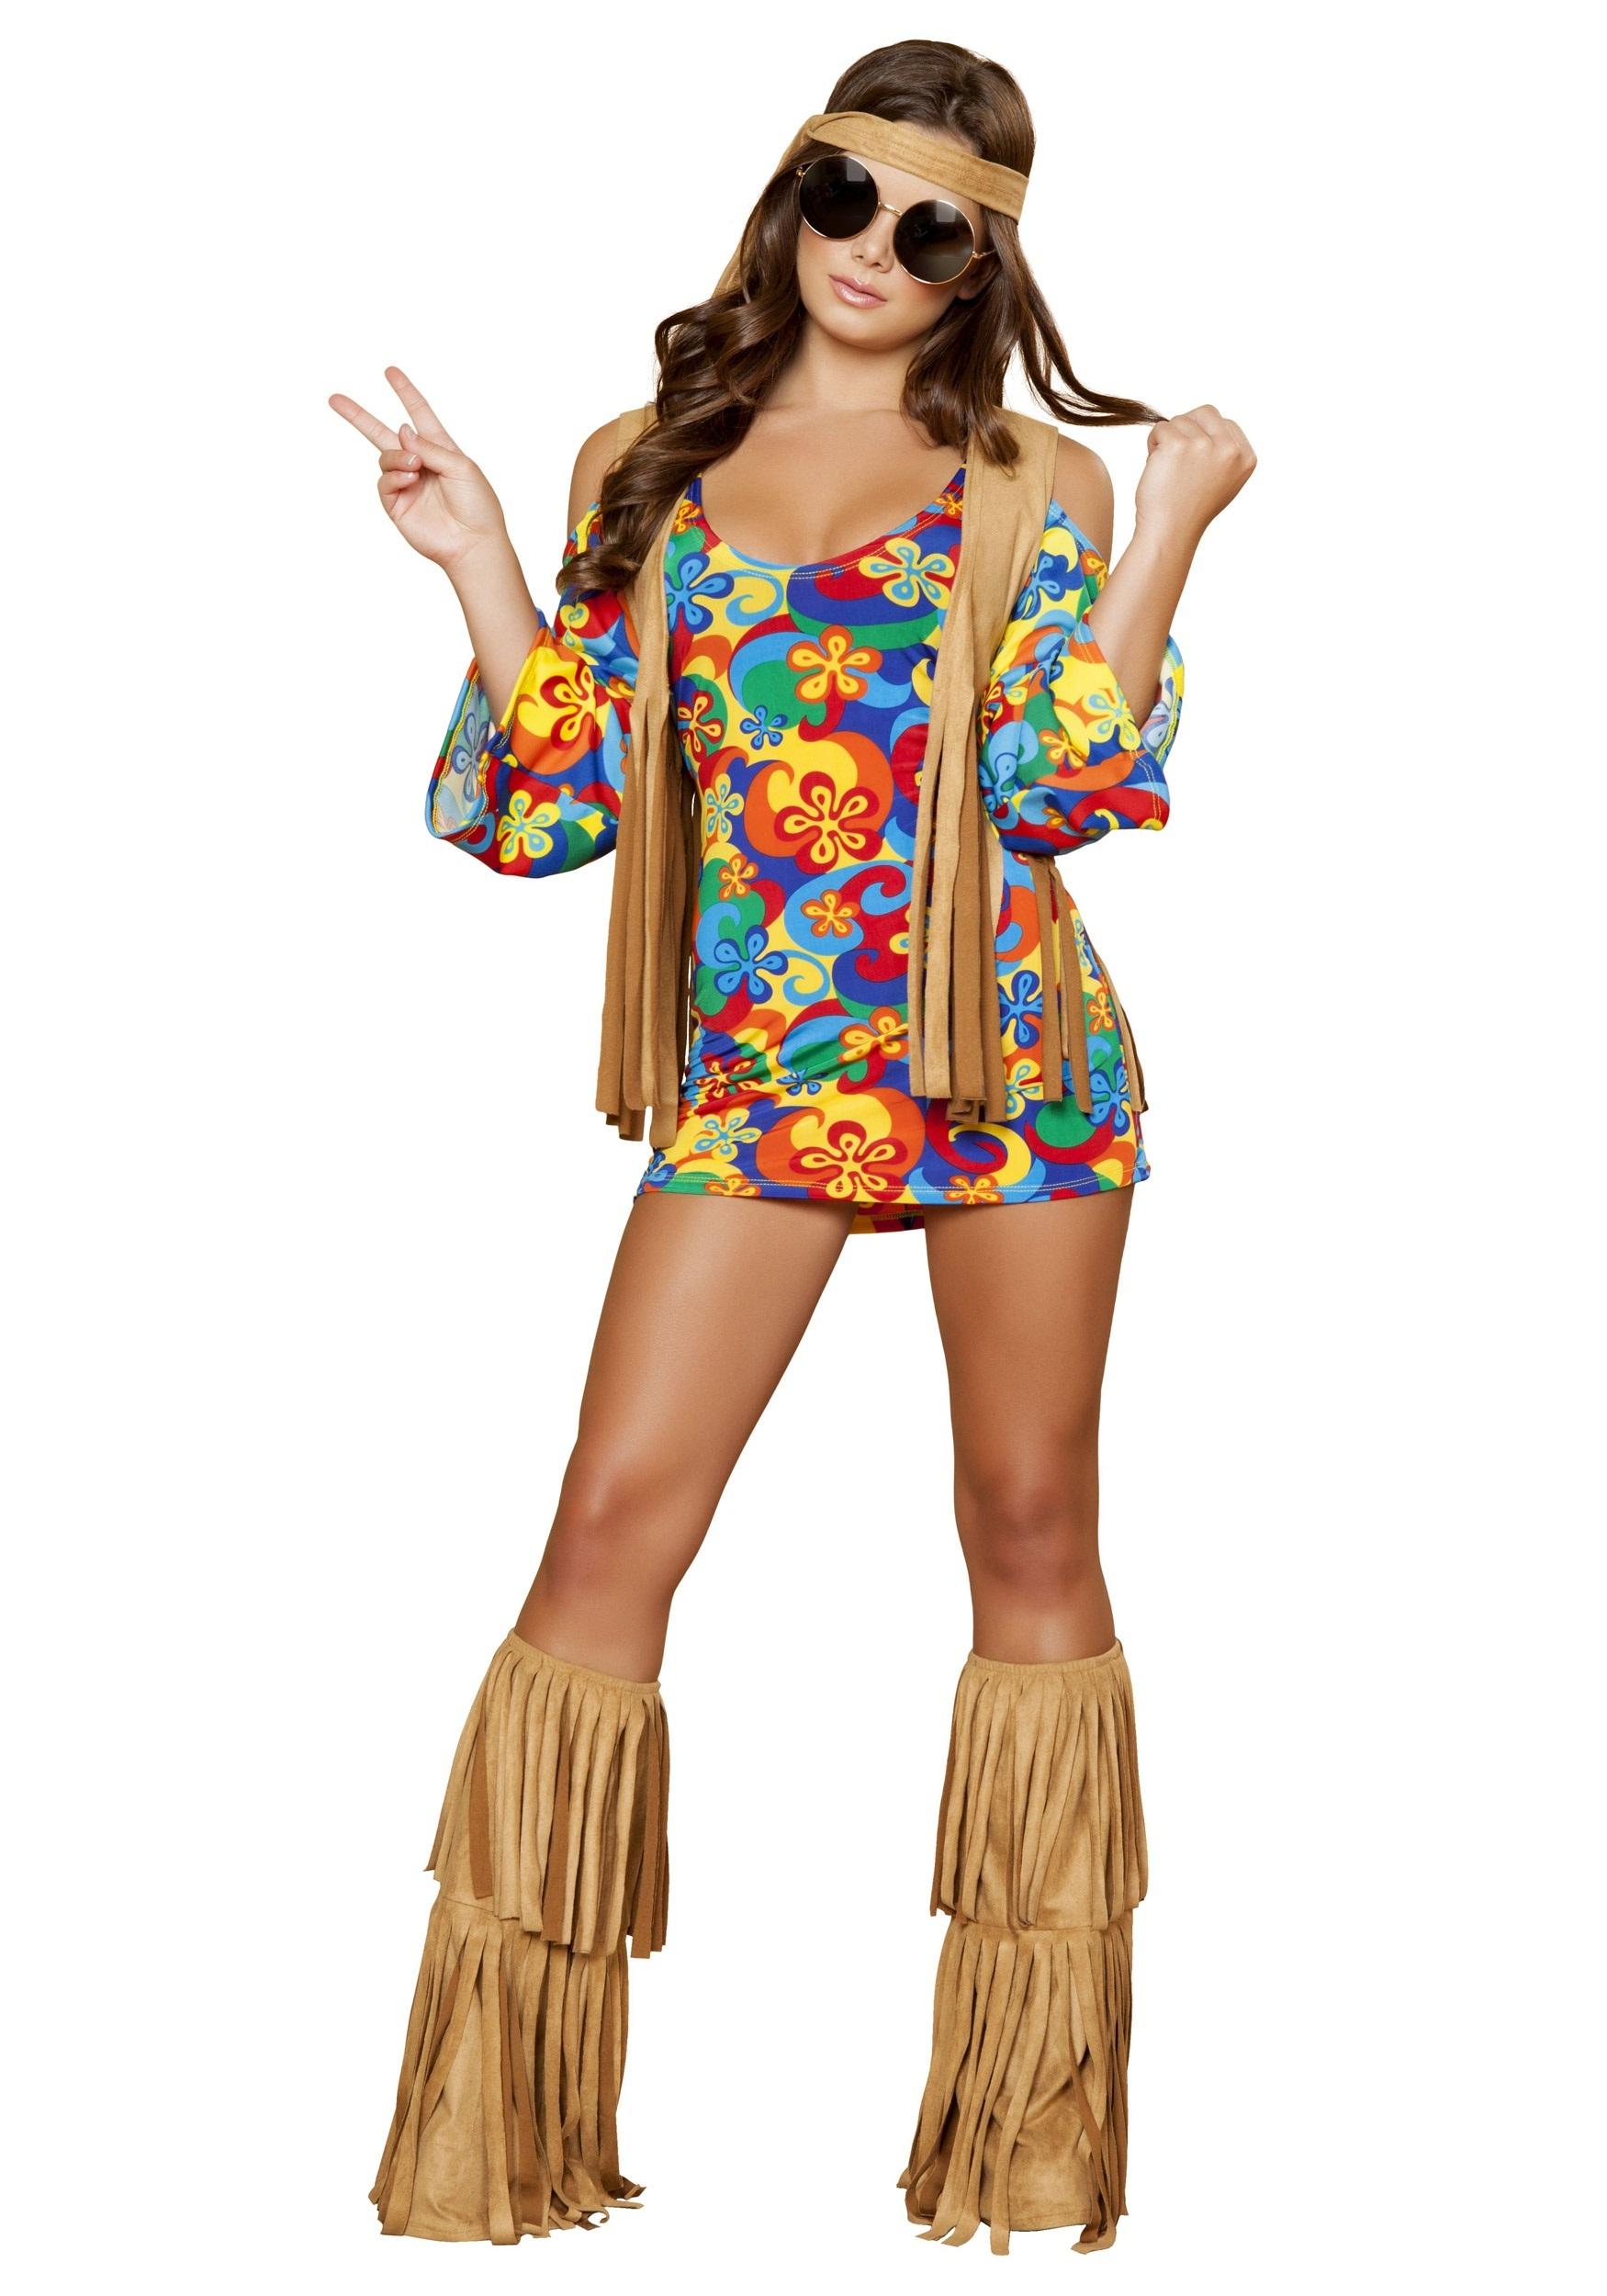 924a3983c960 Plus Size Womens Hippie Hottie Costume